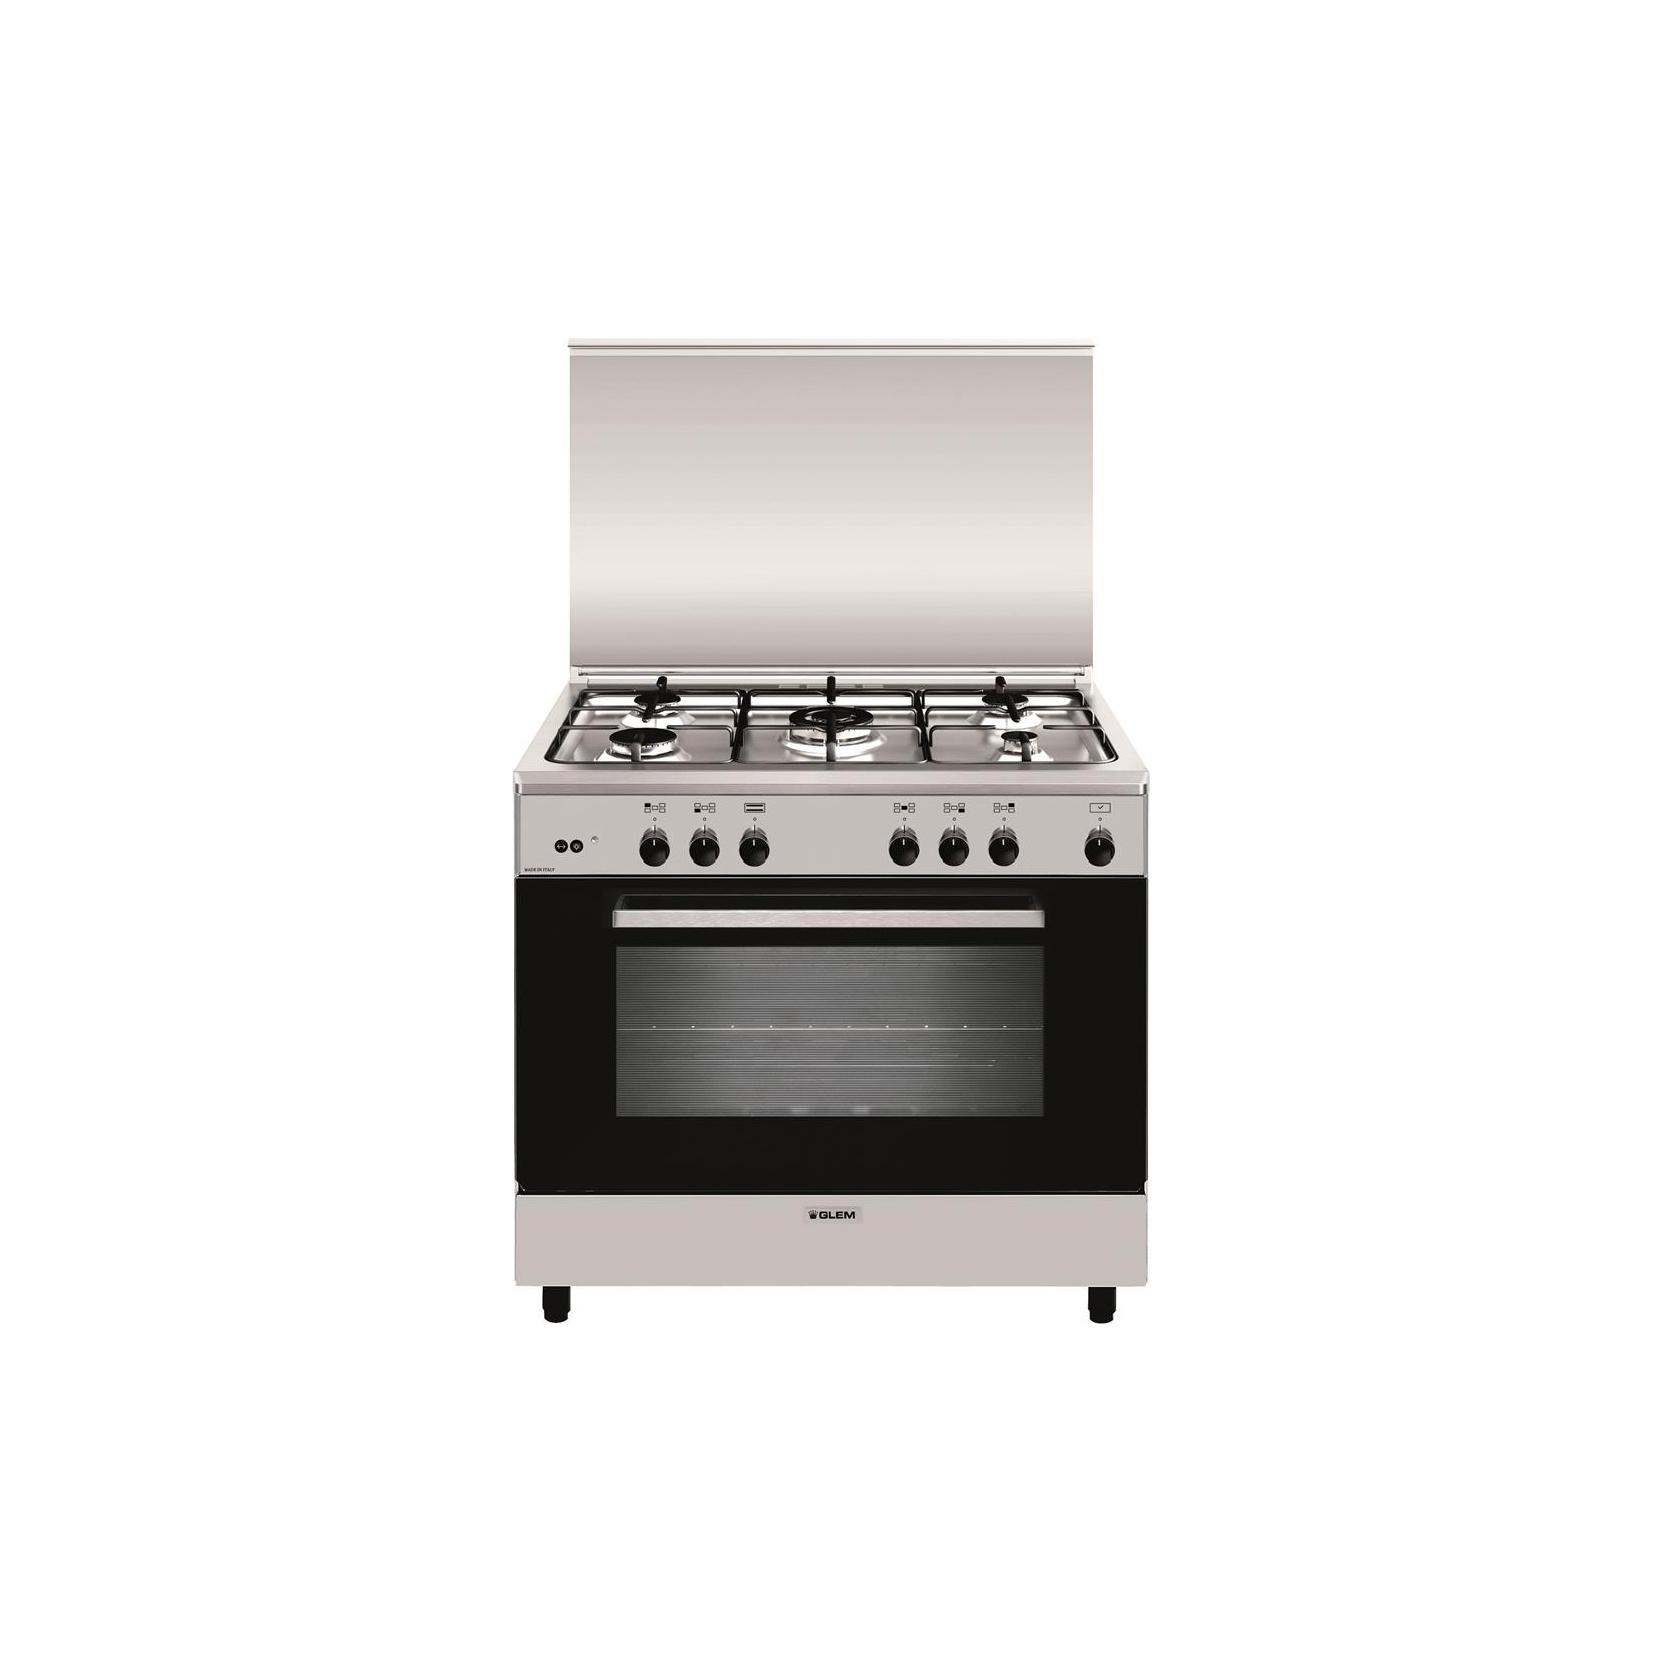 Glem gas cucina a gas a965gi 5 fuochi forno a gas con - Cucine a gas con forno elettrico ...